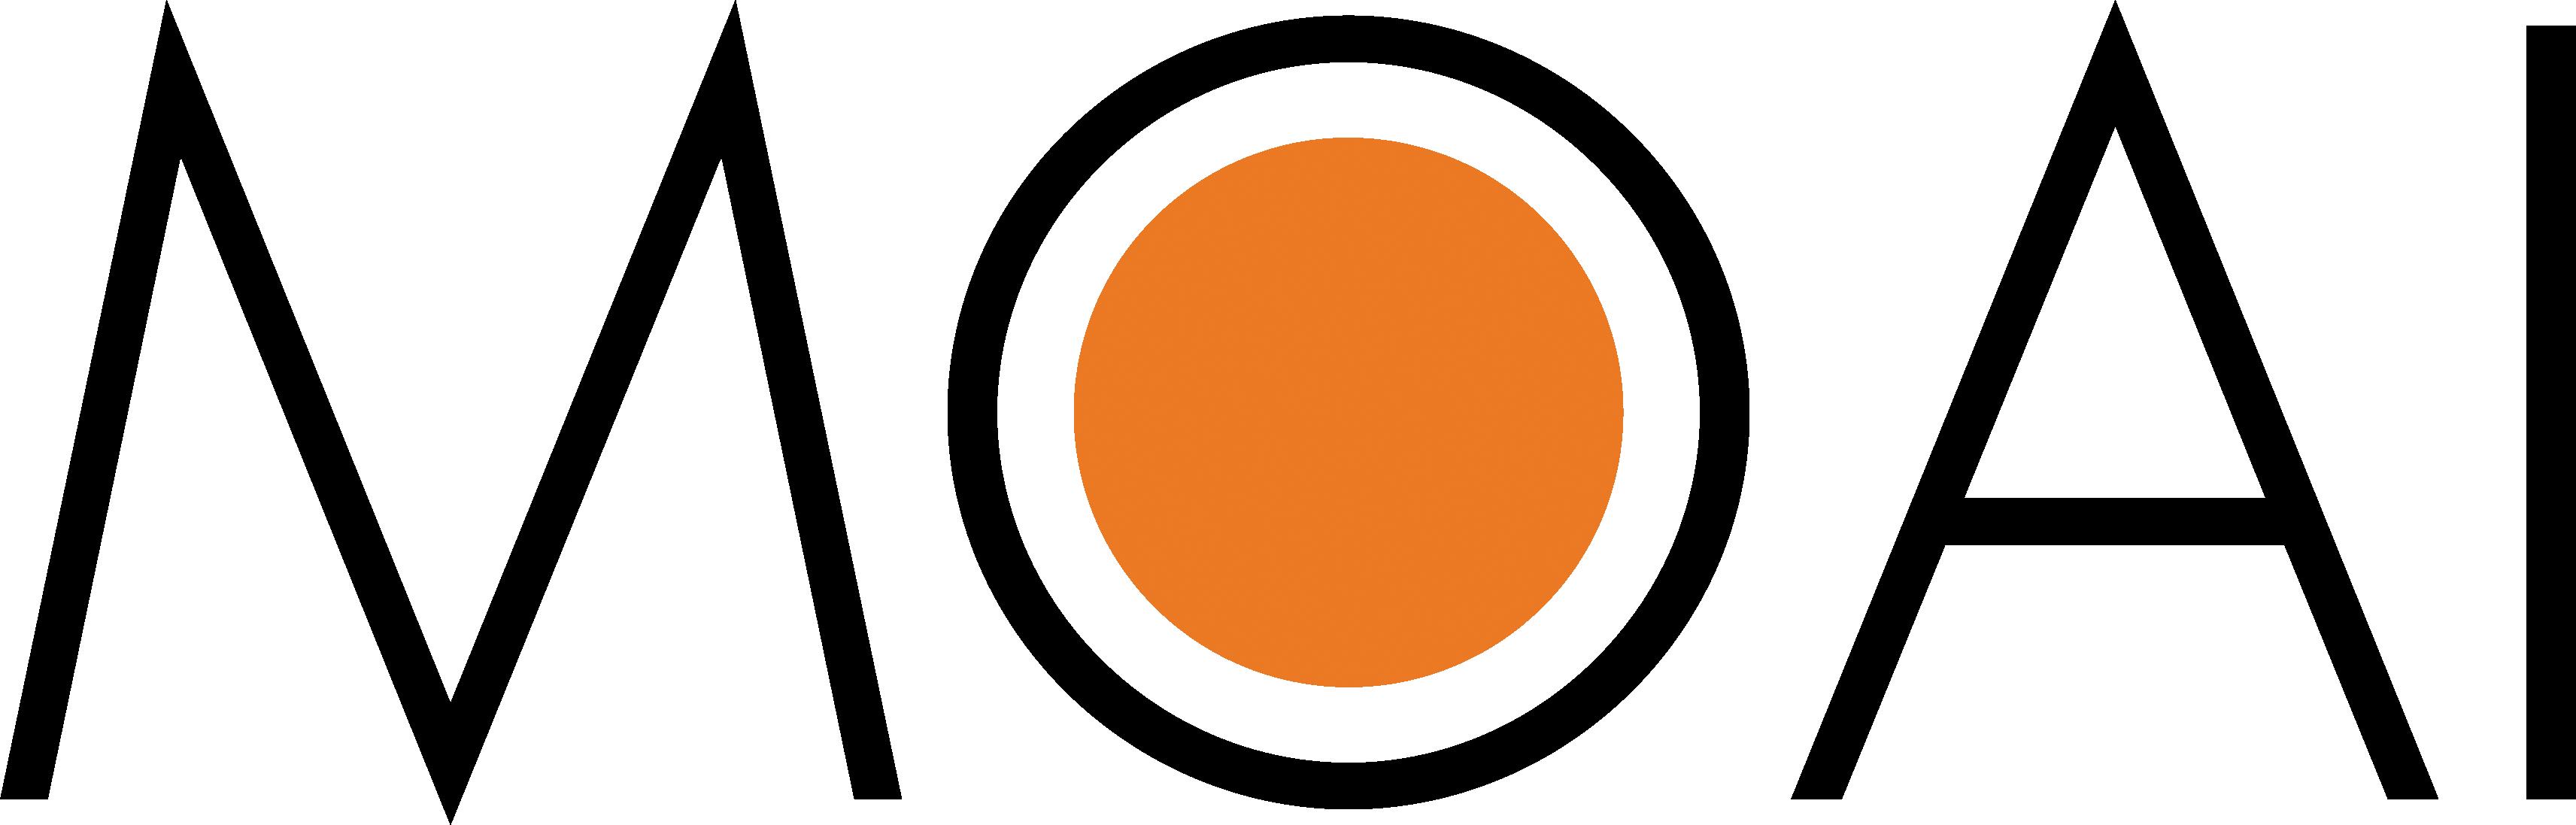 moai-logo